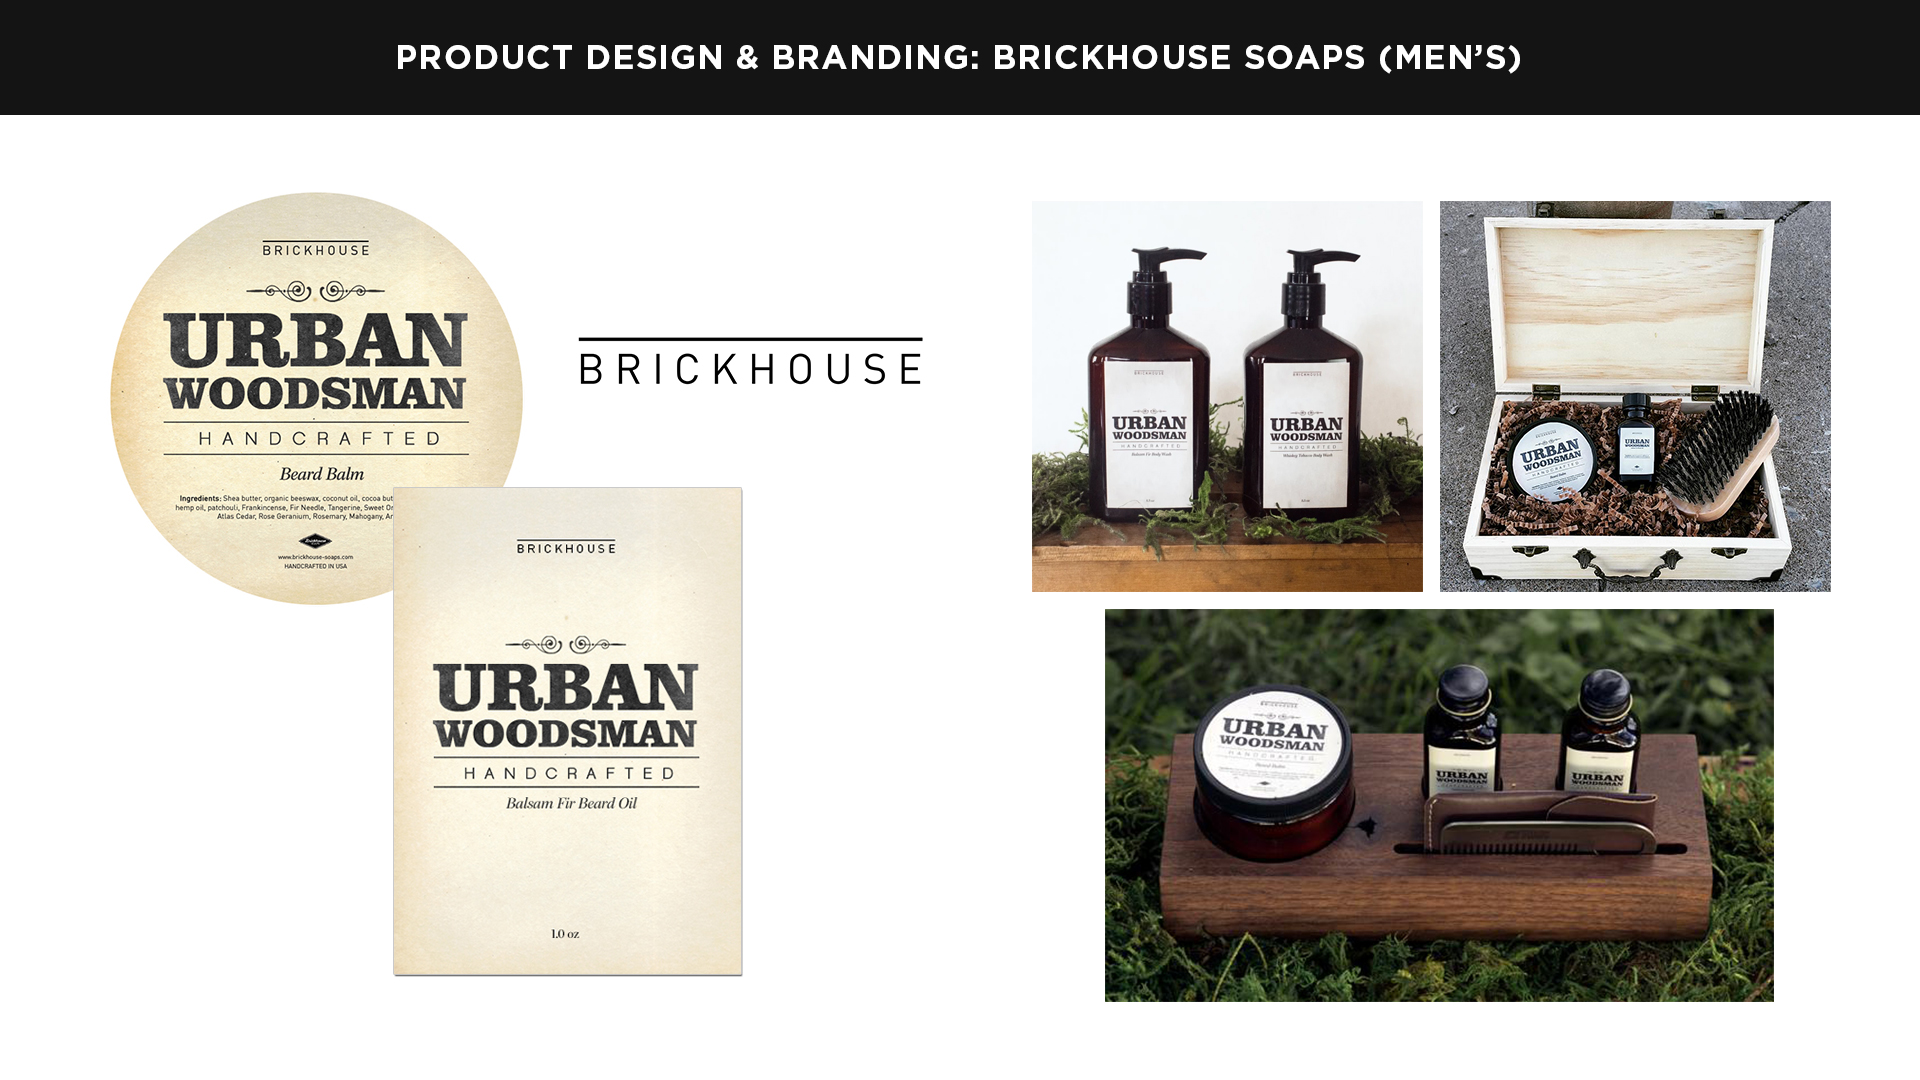 12 - Brickhouse-Products-Men-(Portfolio-Mock-up).jpg